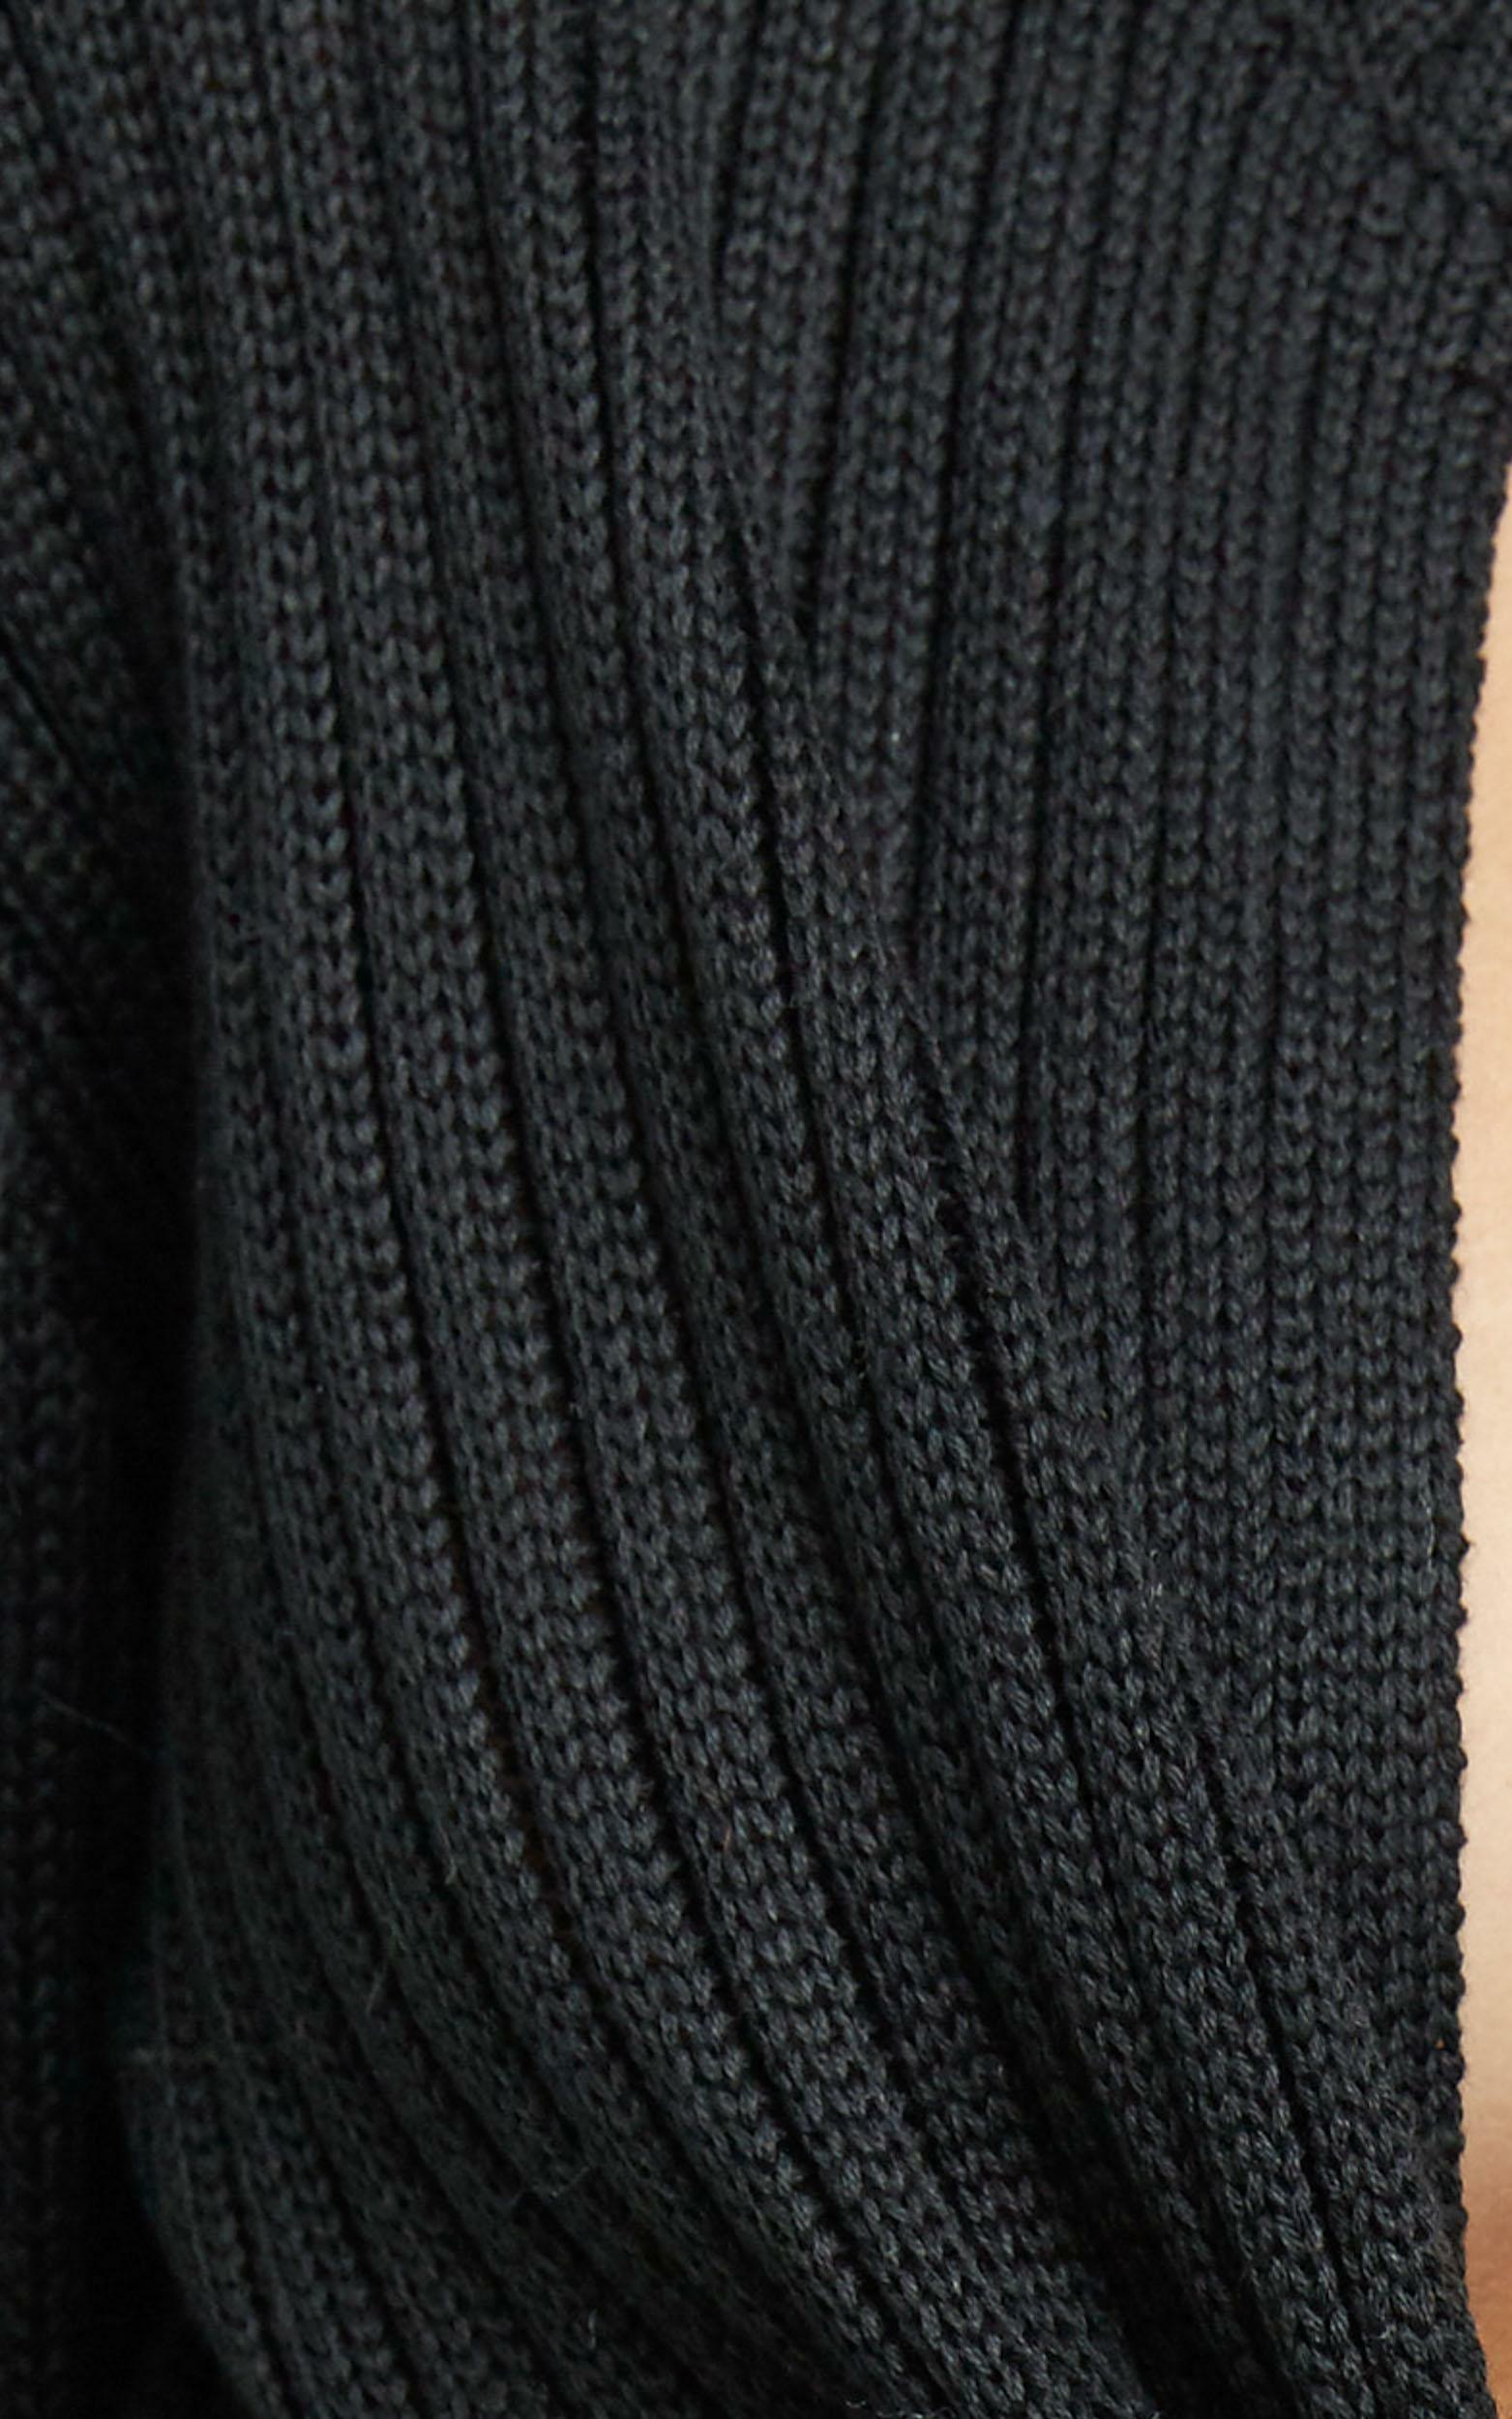 Leandra Knit Top in Black, BLK1, hi-res image number null